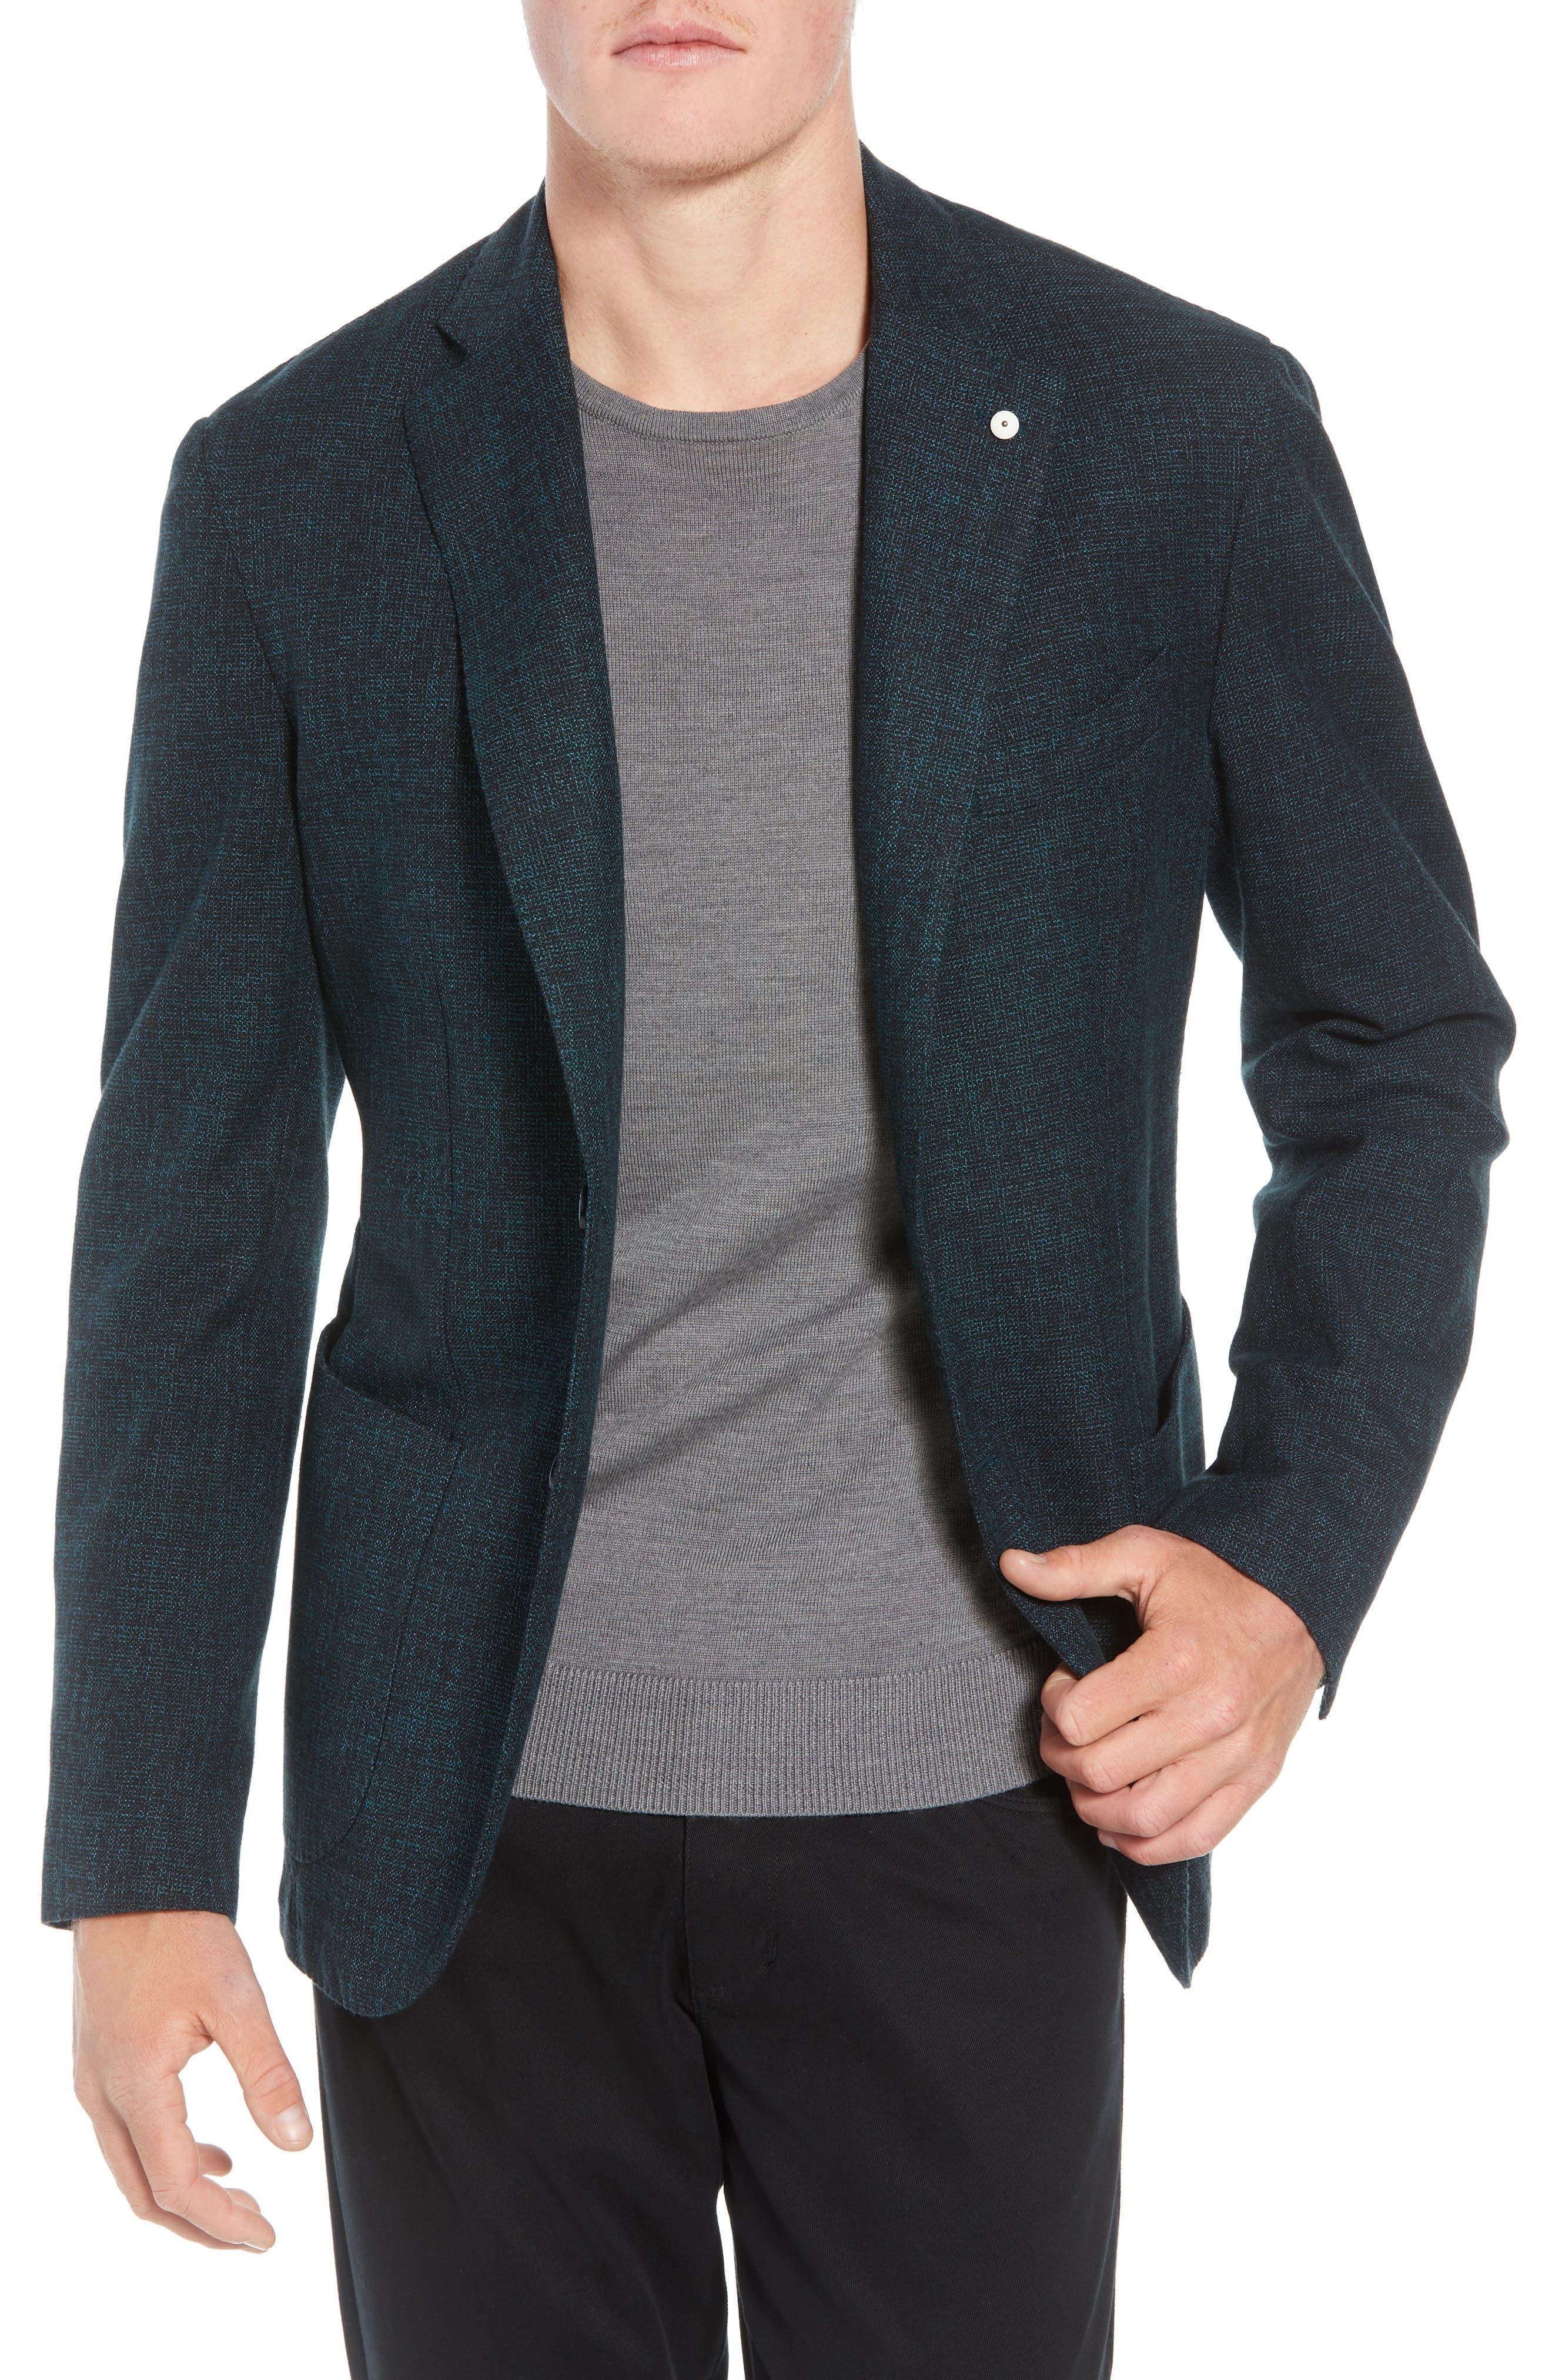 L.B.M 1911 Classic Fit Cotton & Wool Blazer,                             Main thumbnail 1, color,                             GREEN